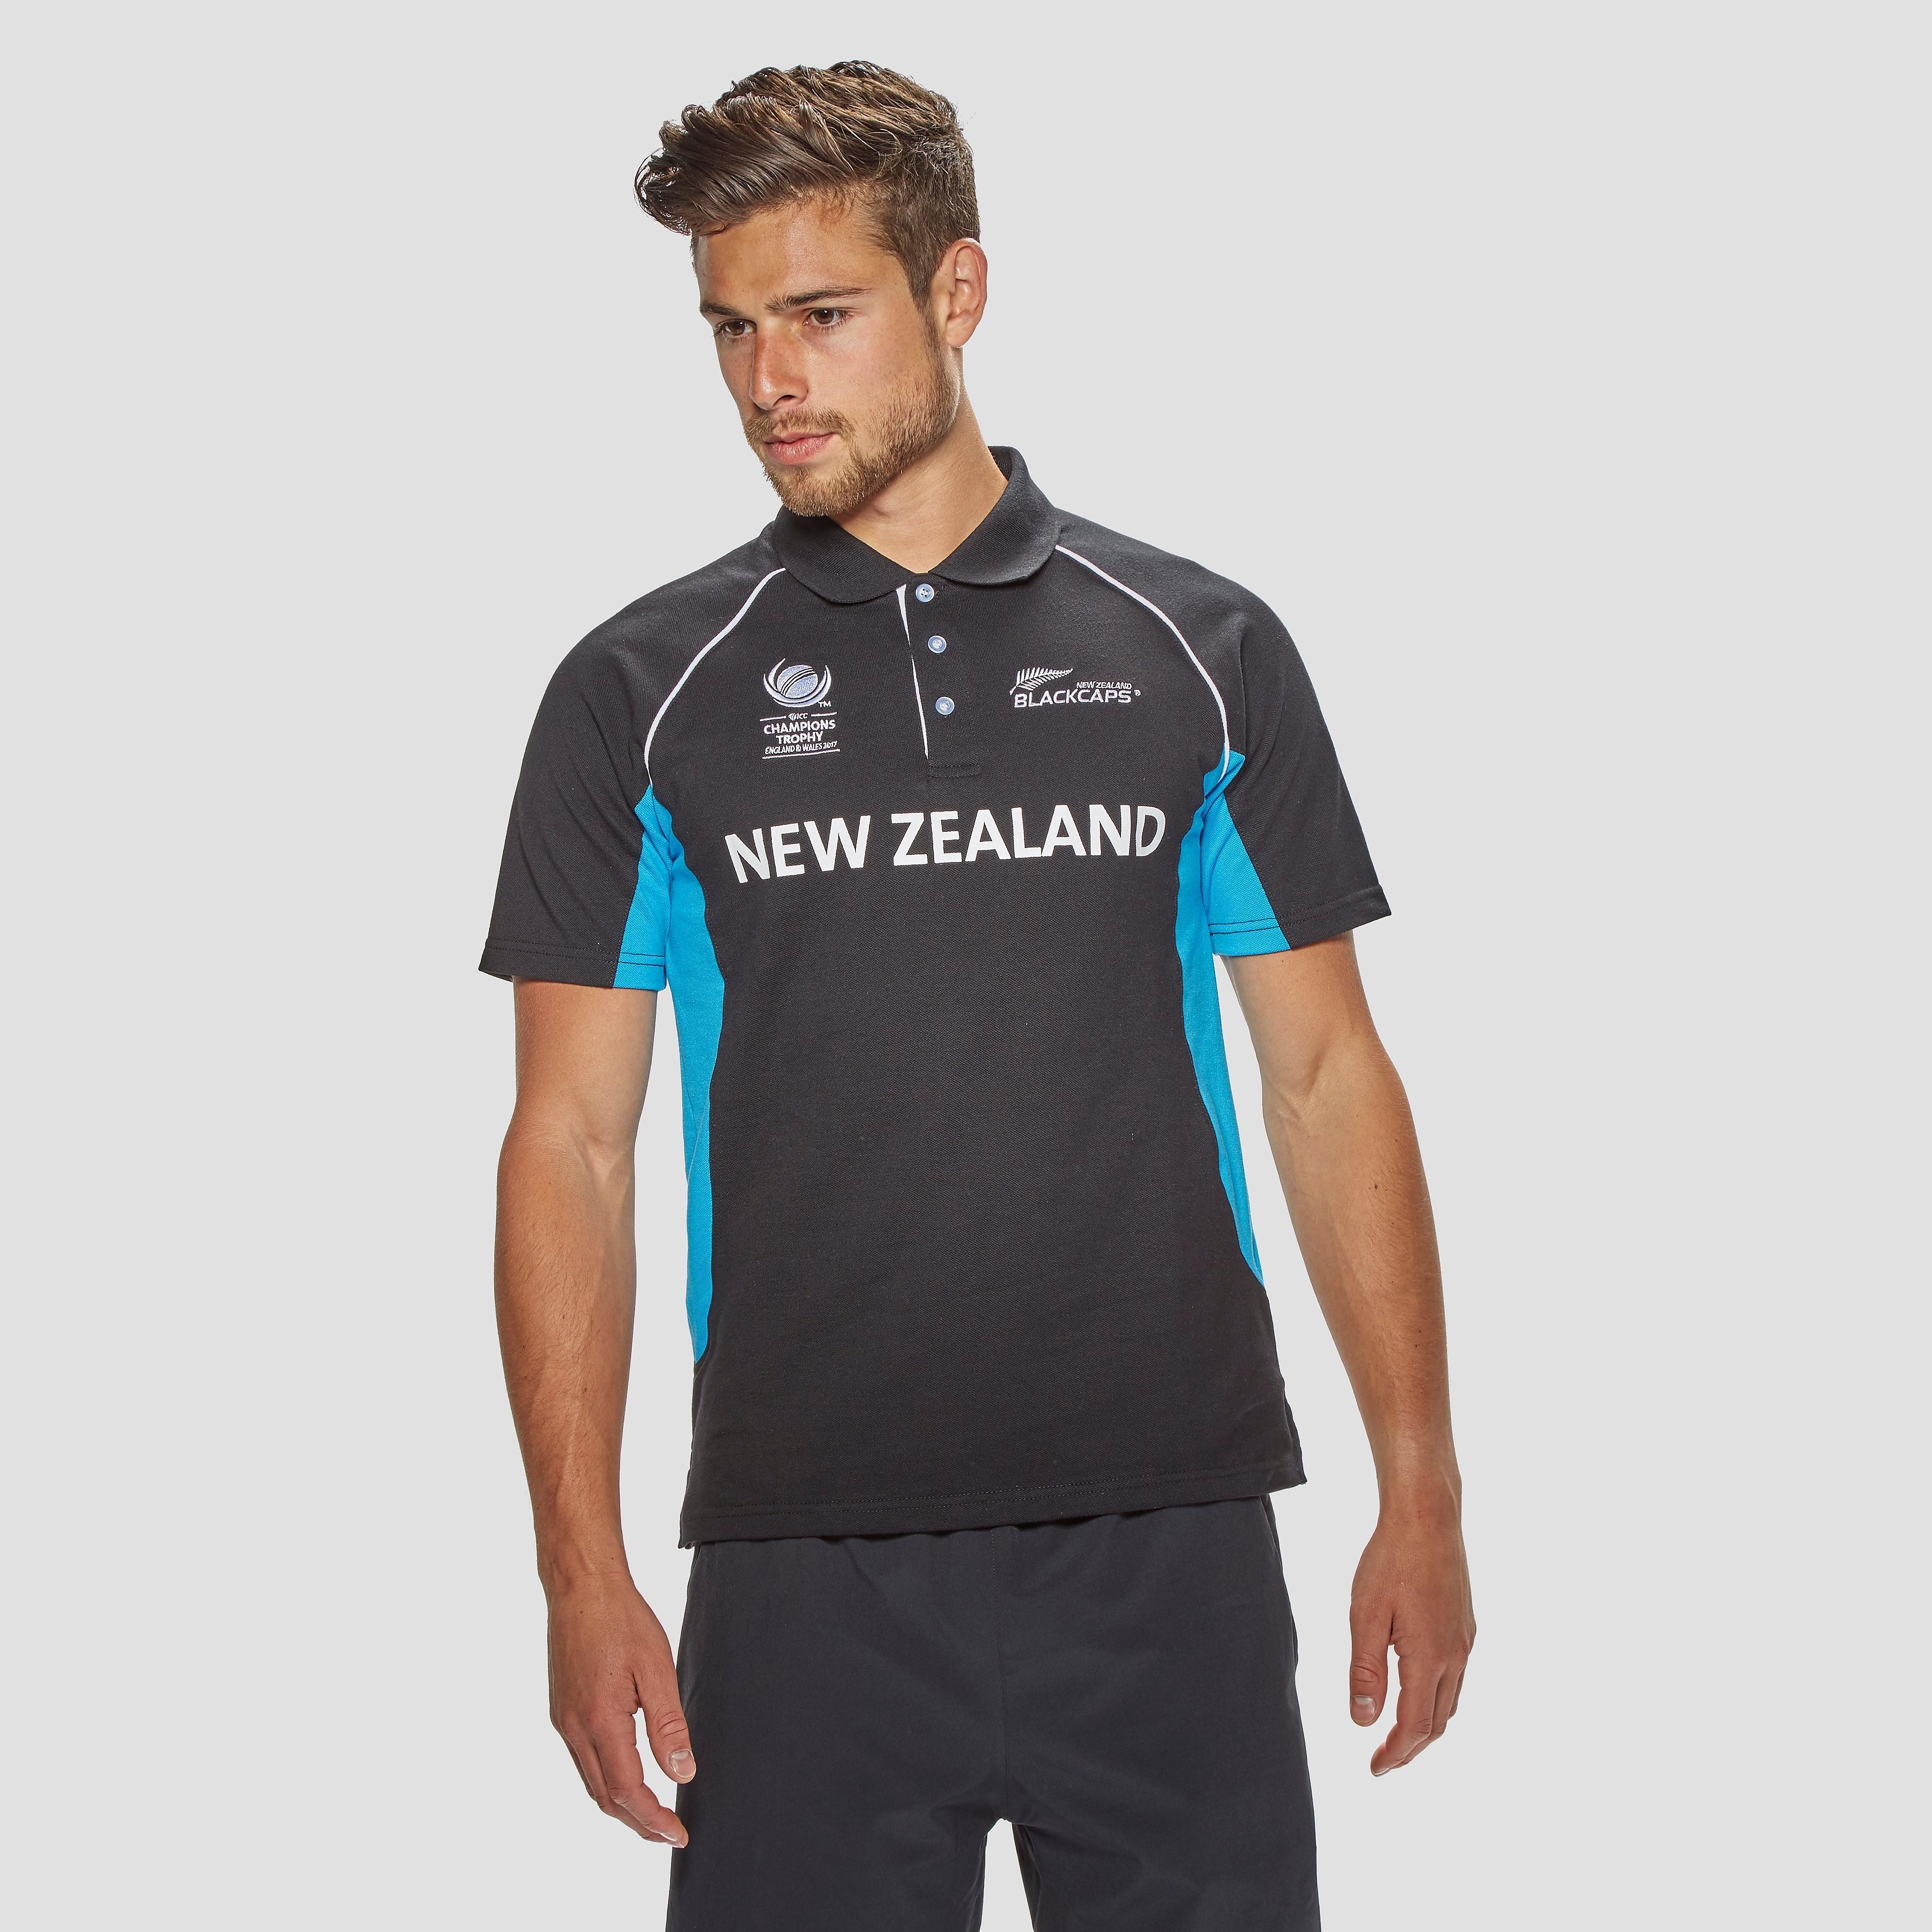 Sportfolio ICC Champions Trophy 2017 New Zealand Men's Cricket Jersey